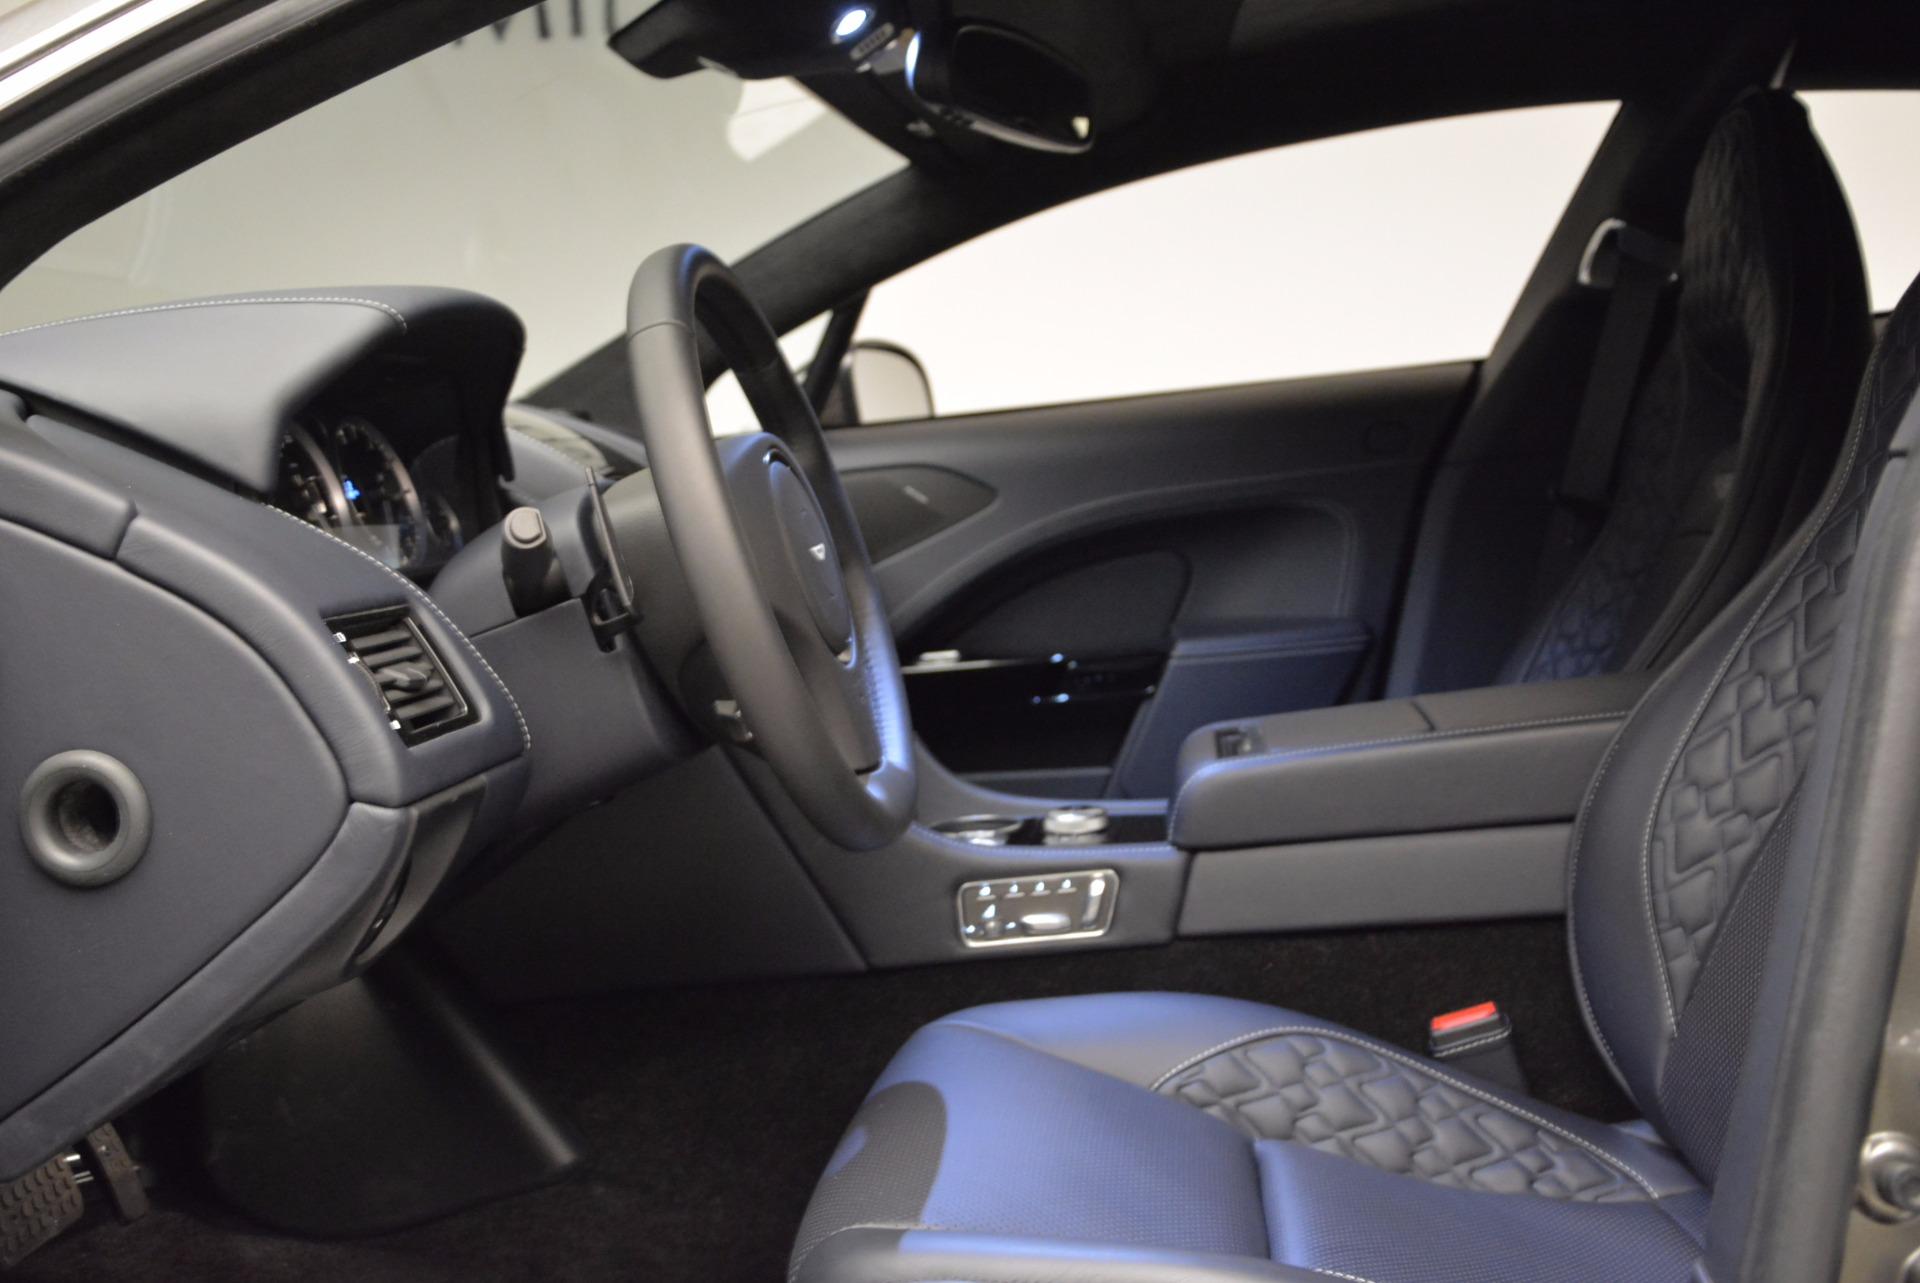 Used 2017 Aston Martin Rapide S Sedan For Sale In Greenwich, CT 1843_p13